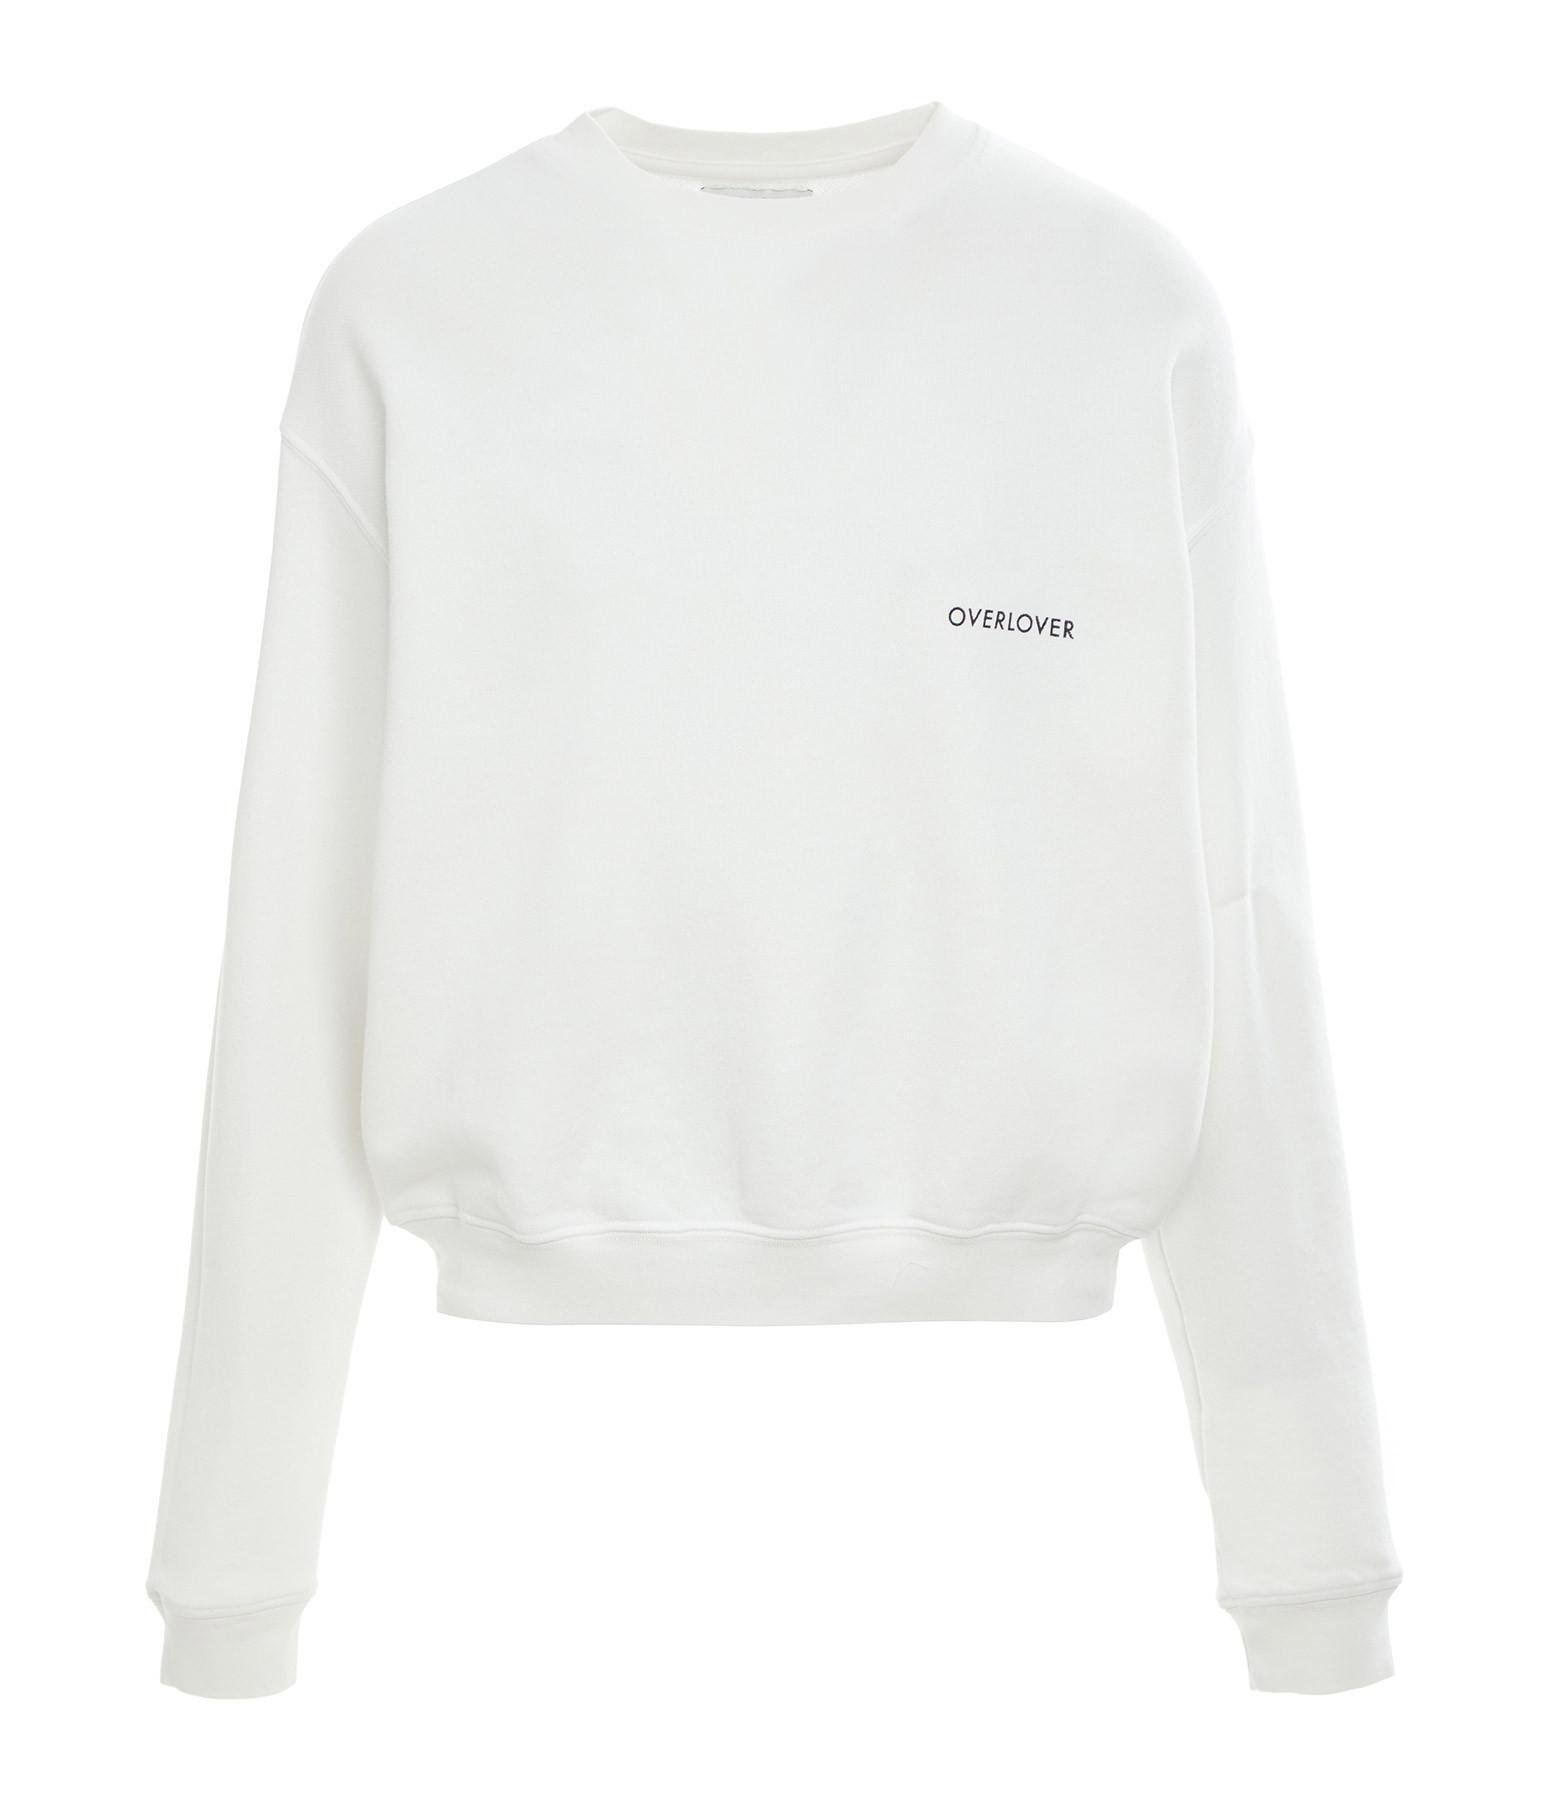 OVERLOVER - Sweatshirt Cienega Blanc